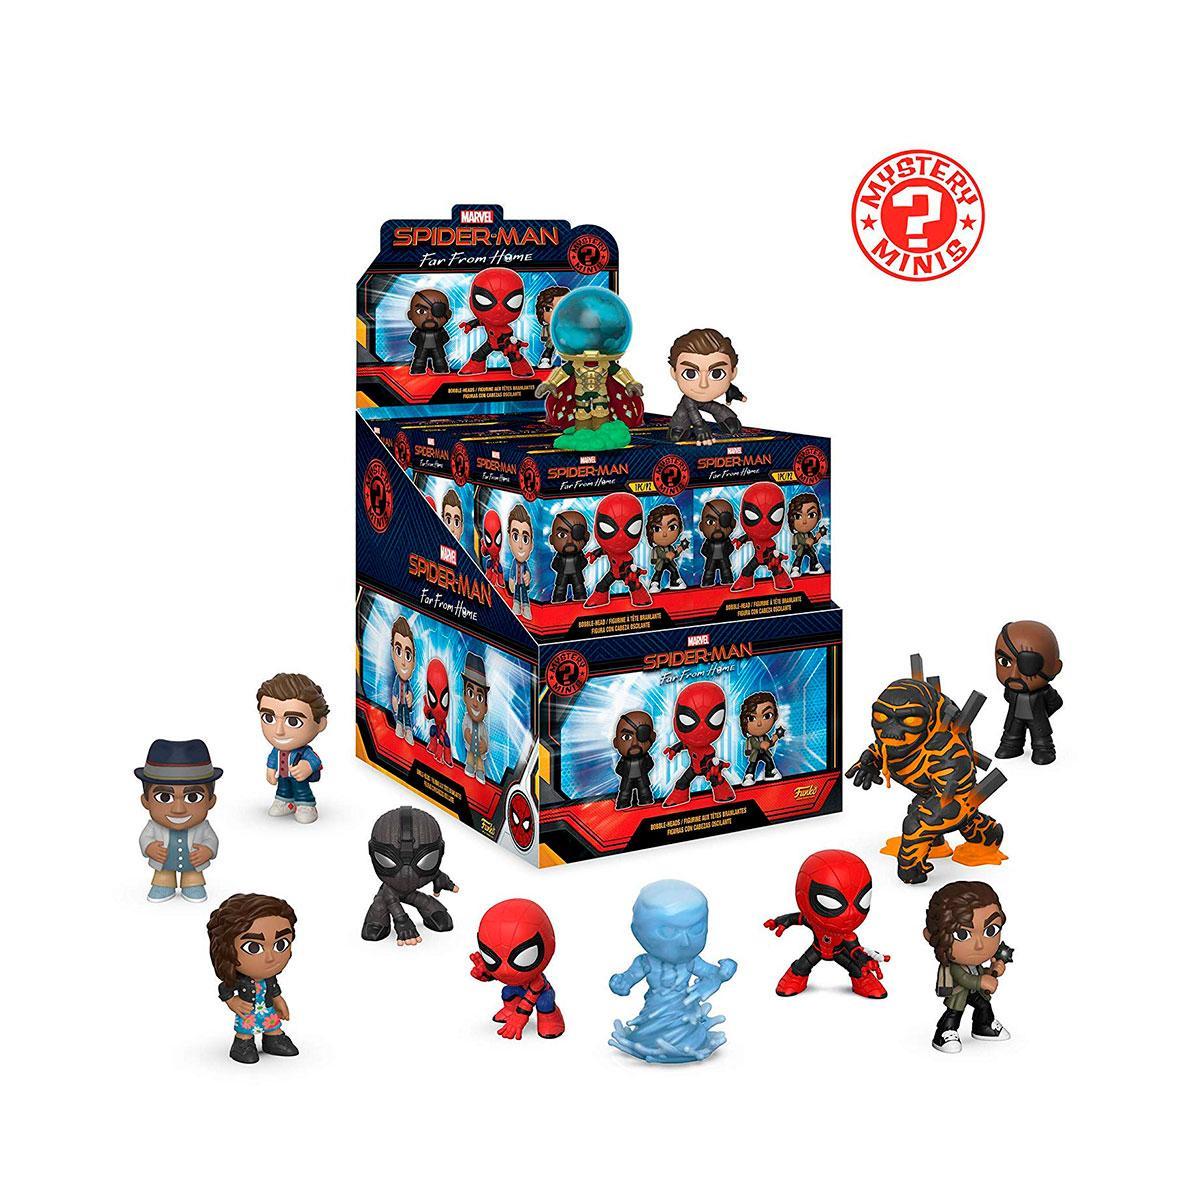 Funko Mystery Minis Игровая фигурка Человек-Паук: Вдали От Дома, 39351